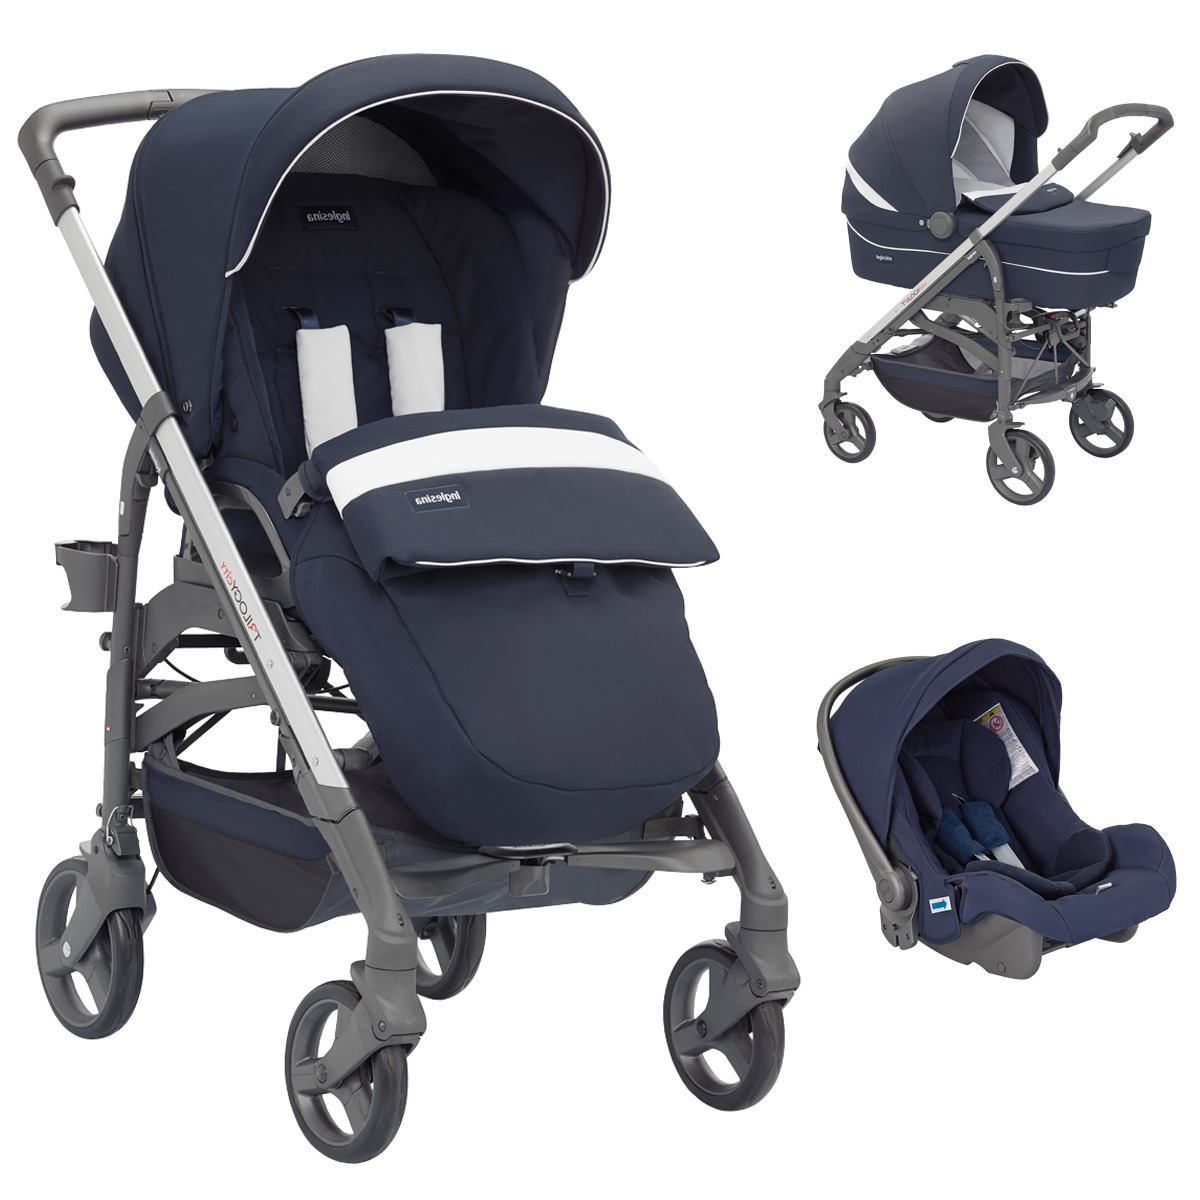 Los mejores carritos de beb 208 cu l comprar for Carritos de bebe maclaren